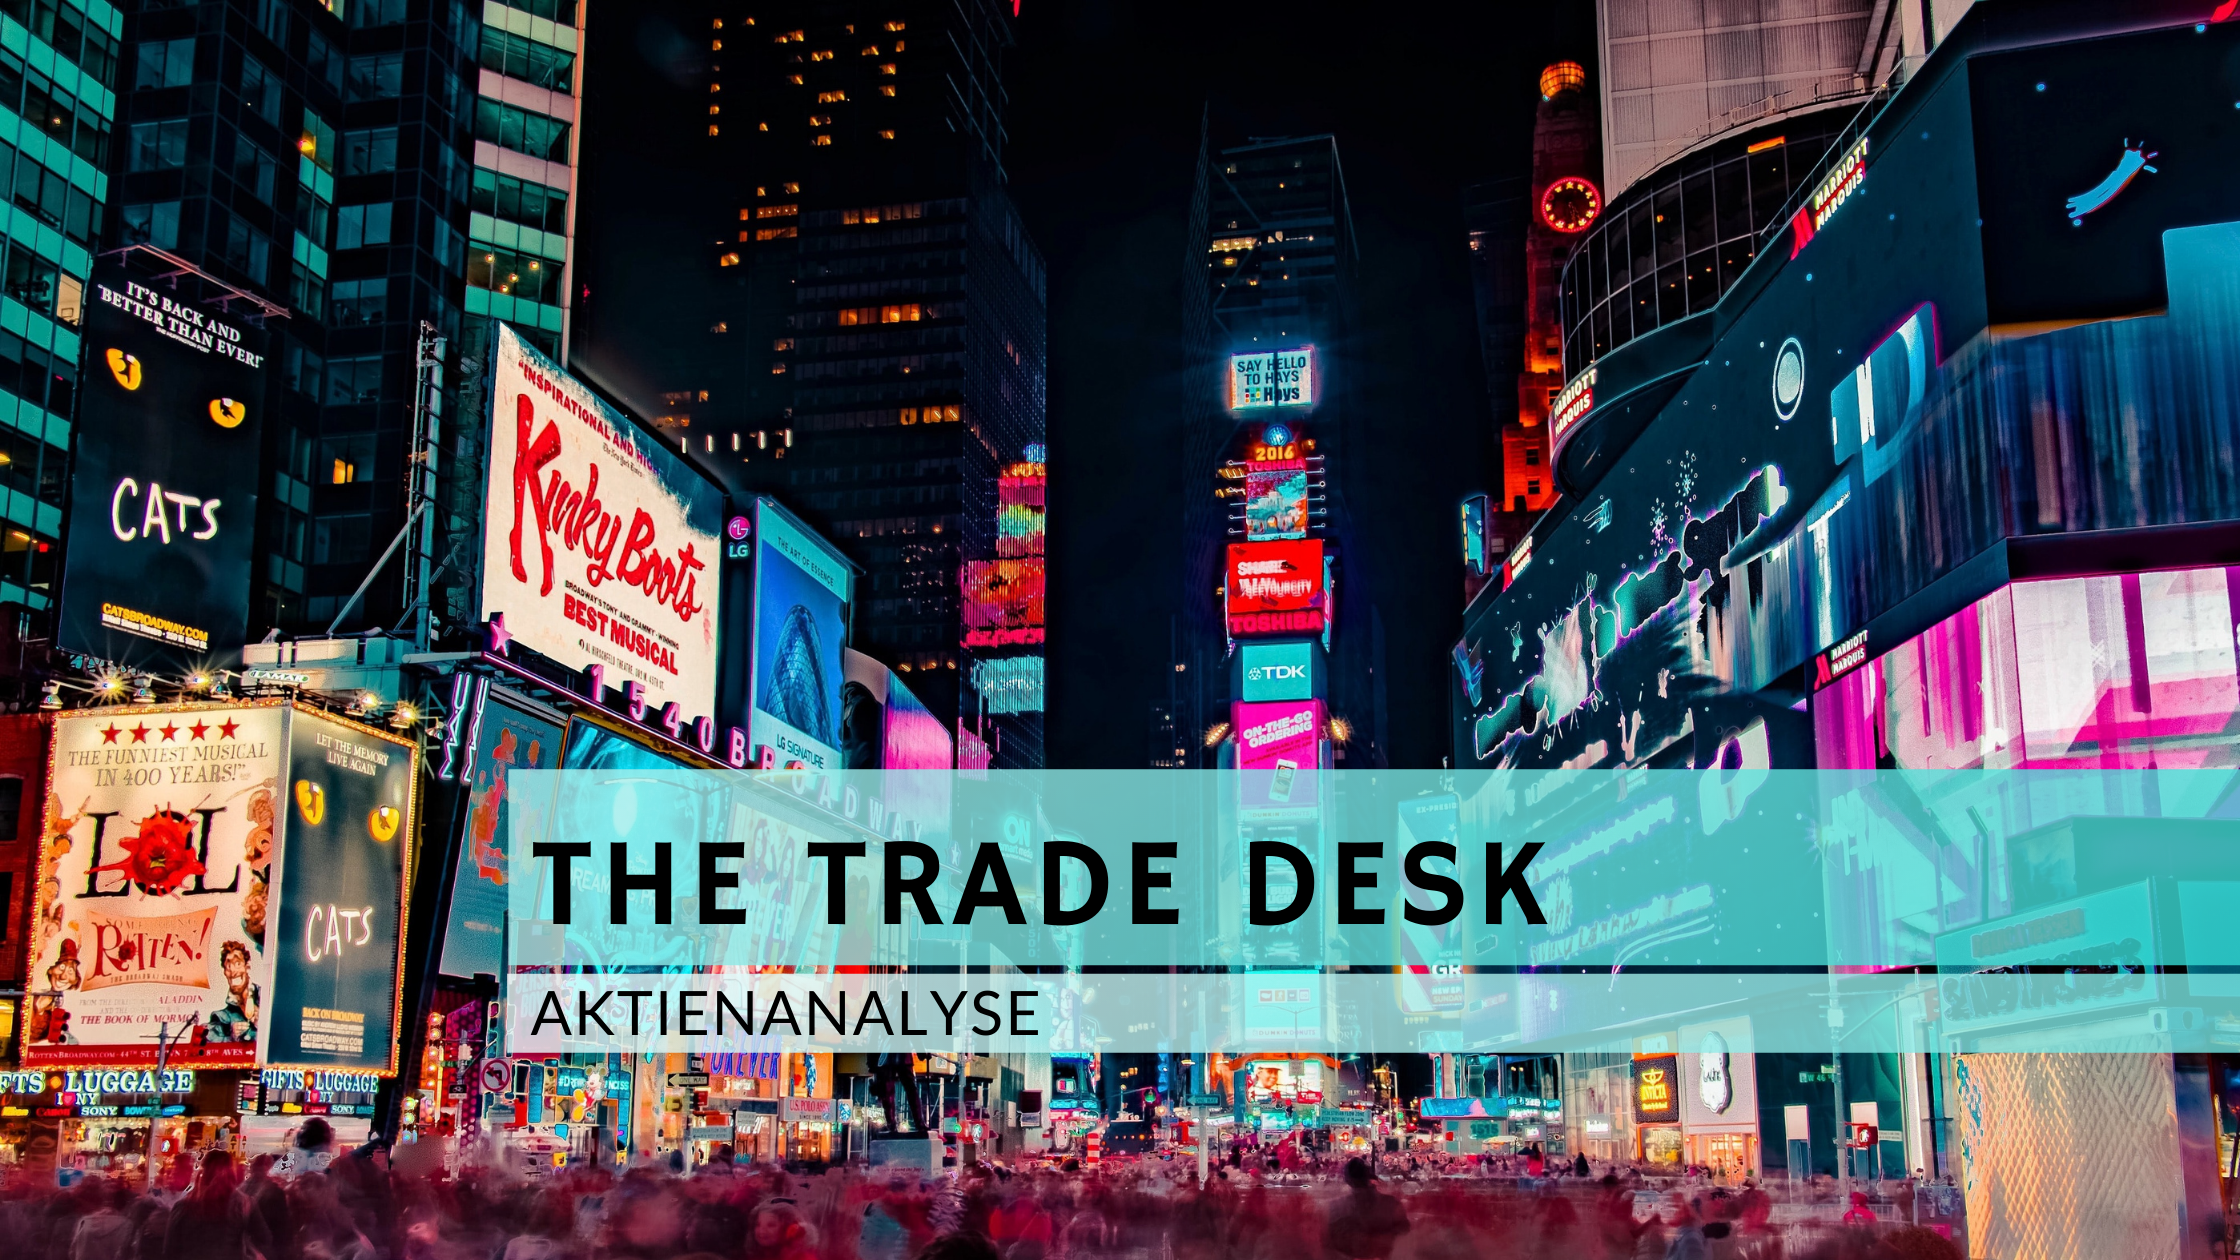 The Trade Desk Aktienanalyse